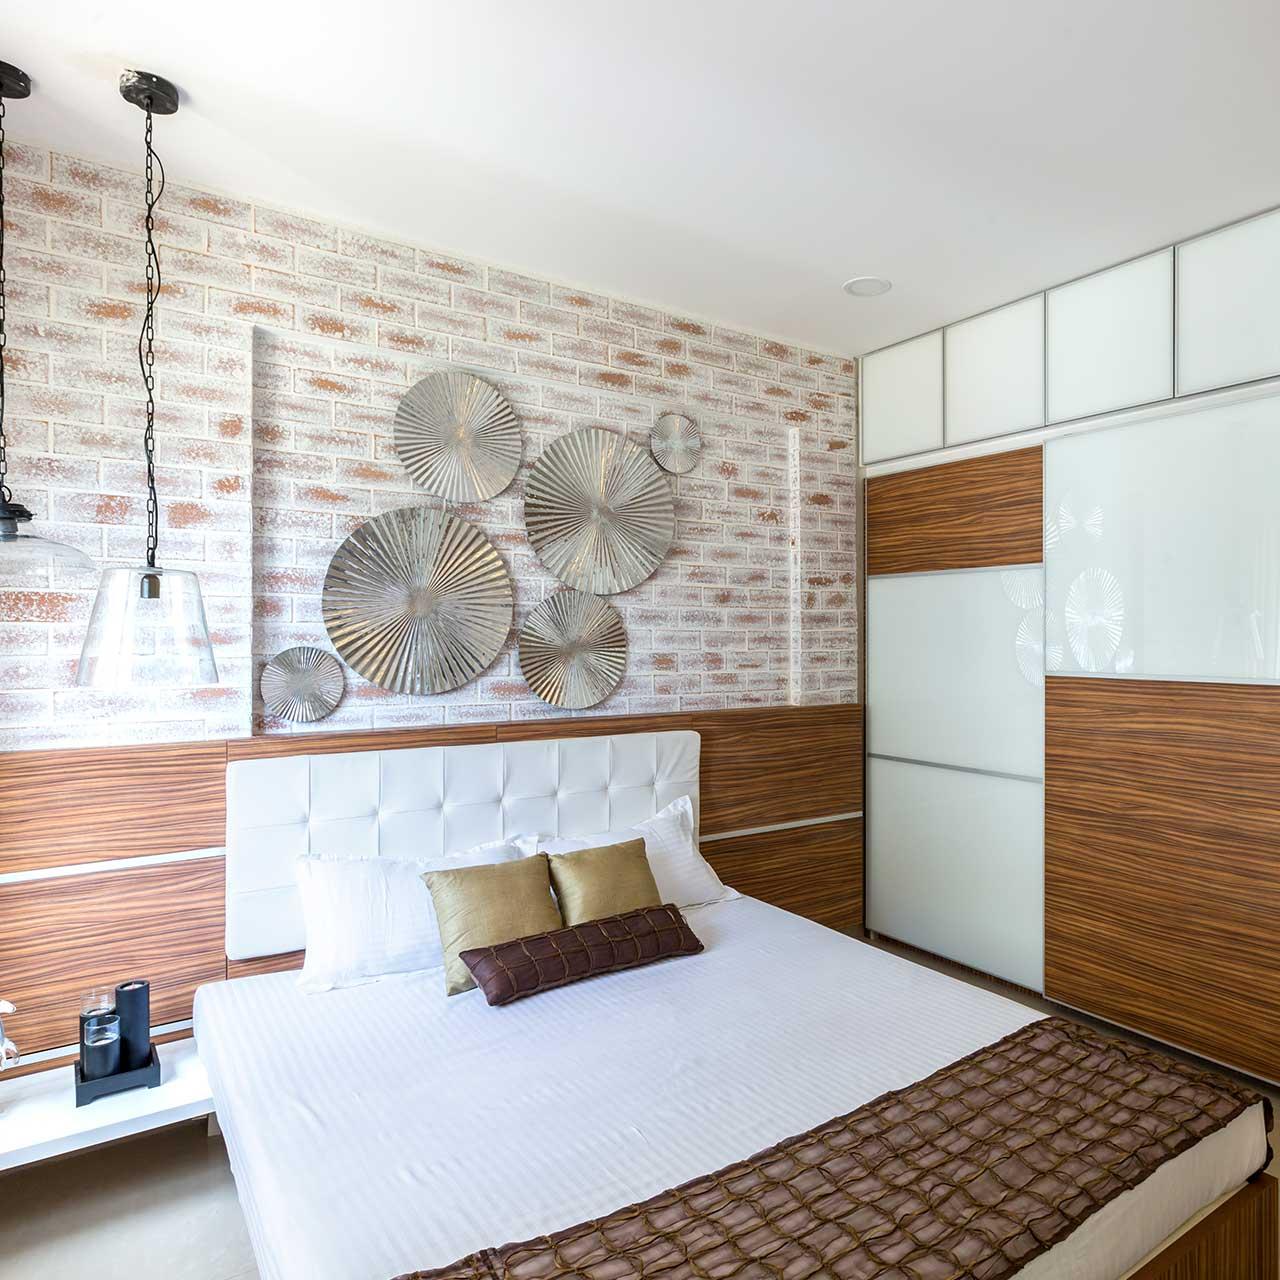 Liven up your Walls for Master Bedroom Design